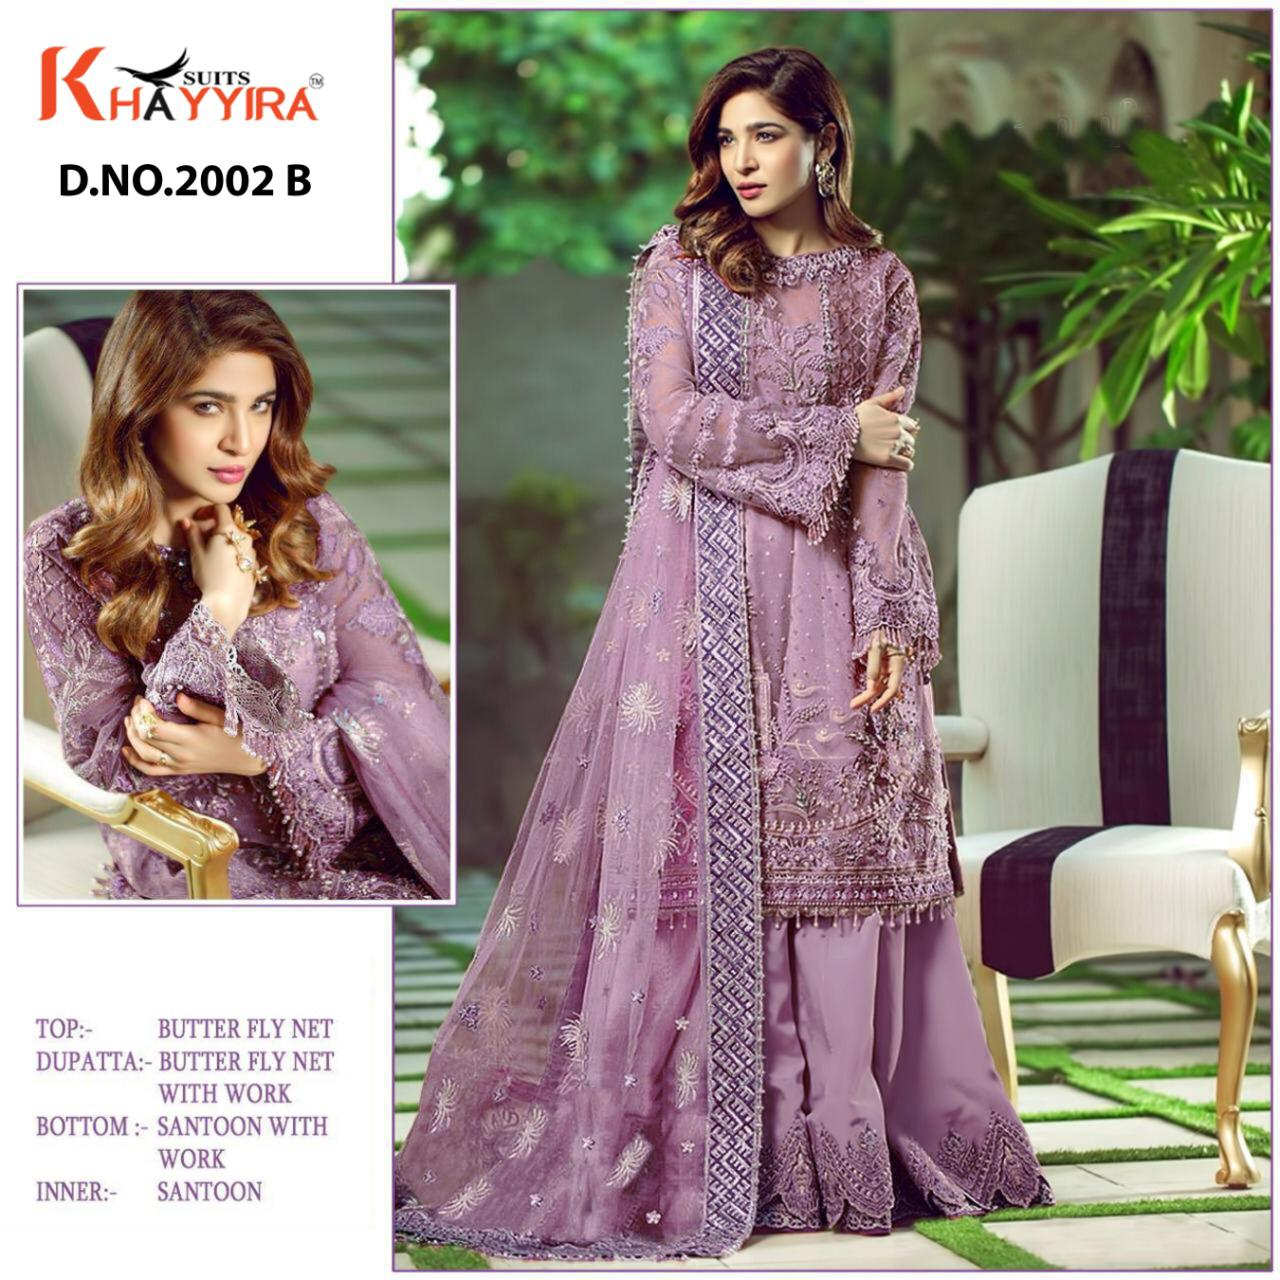 Khayyira Charizma DN 2002 Salwar Suit Wholesale Catalog 4 Pcs 2 - Khayyira Charizma DN 2002 Salwar Suit Wholesale Catalog 4 Pcs